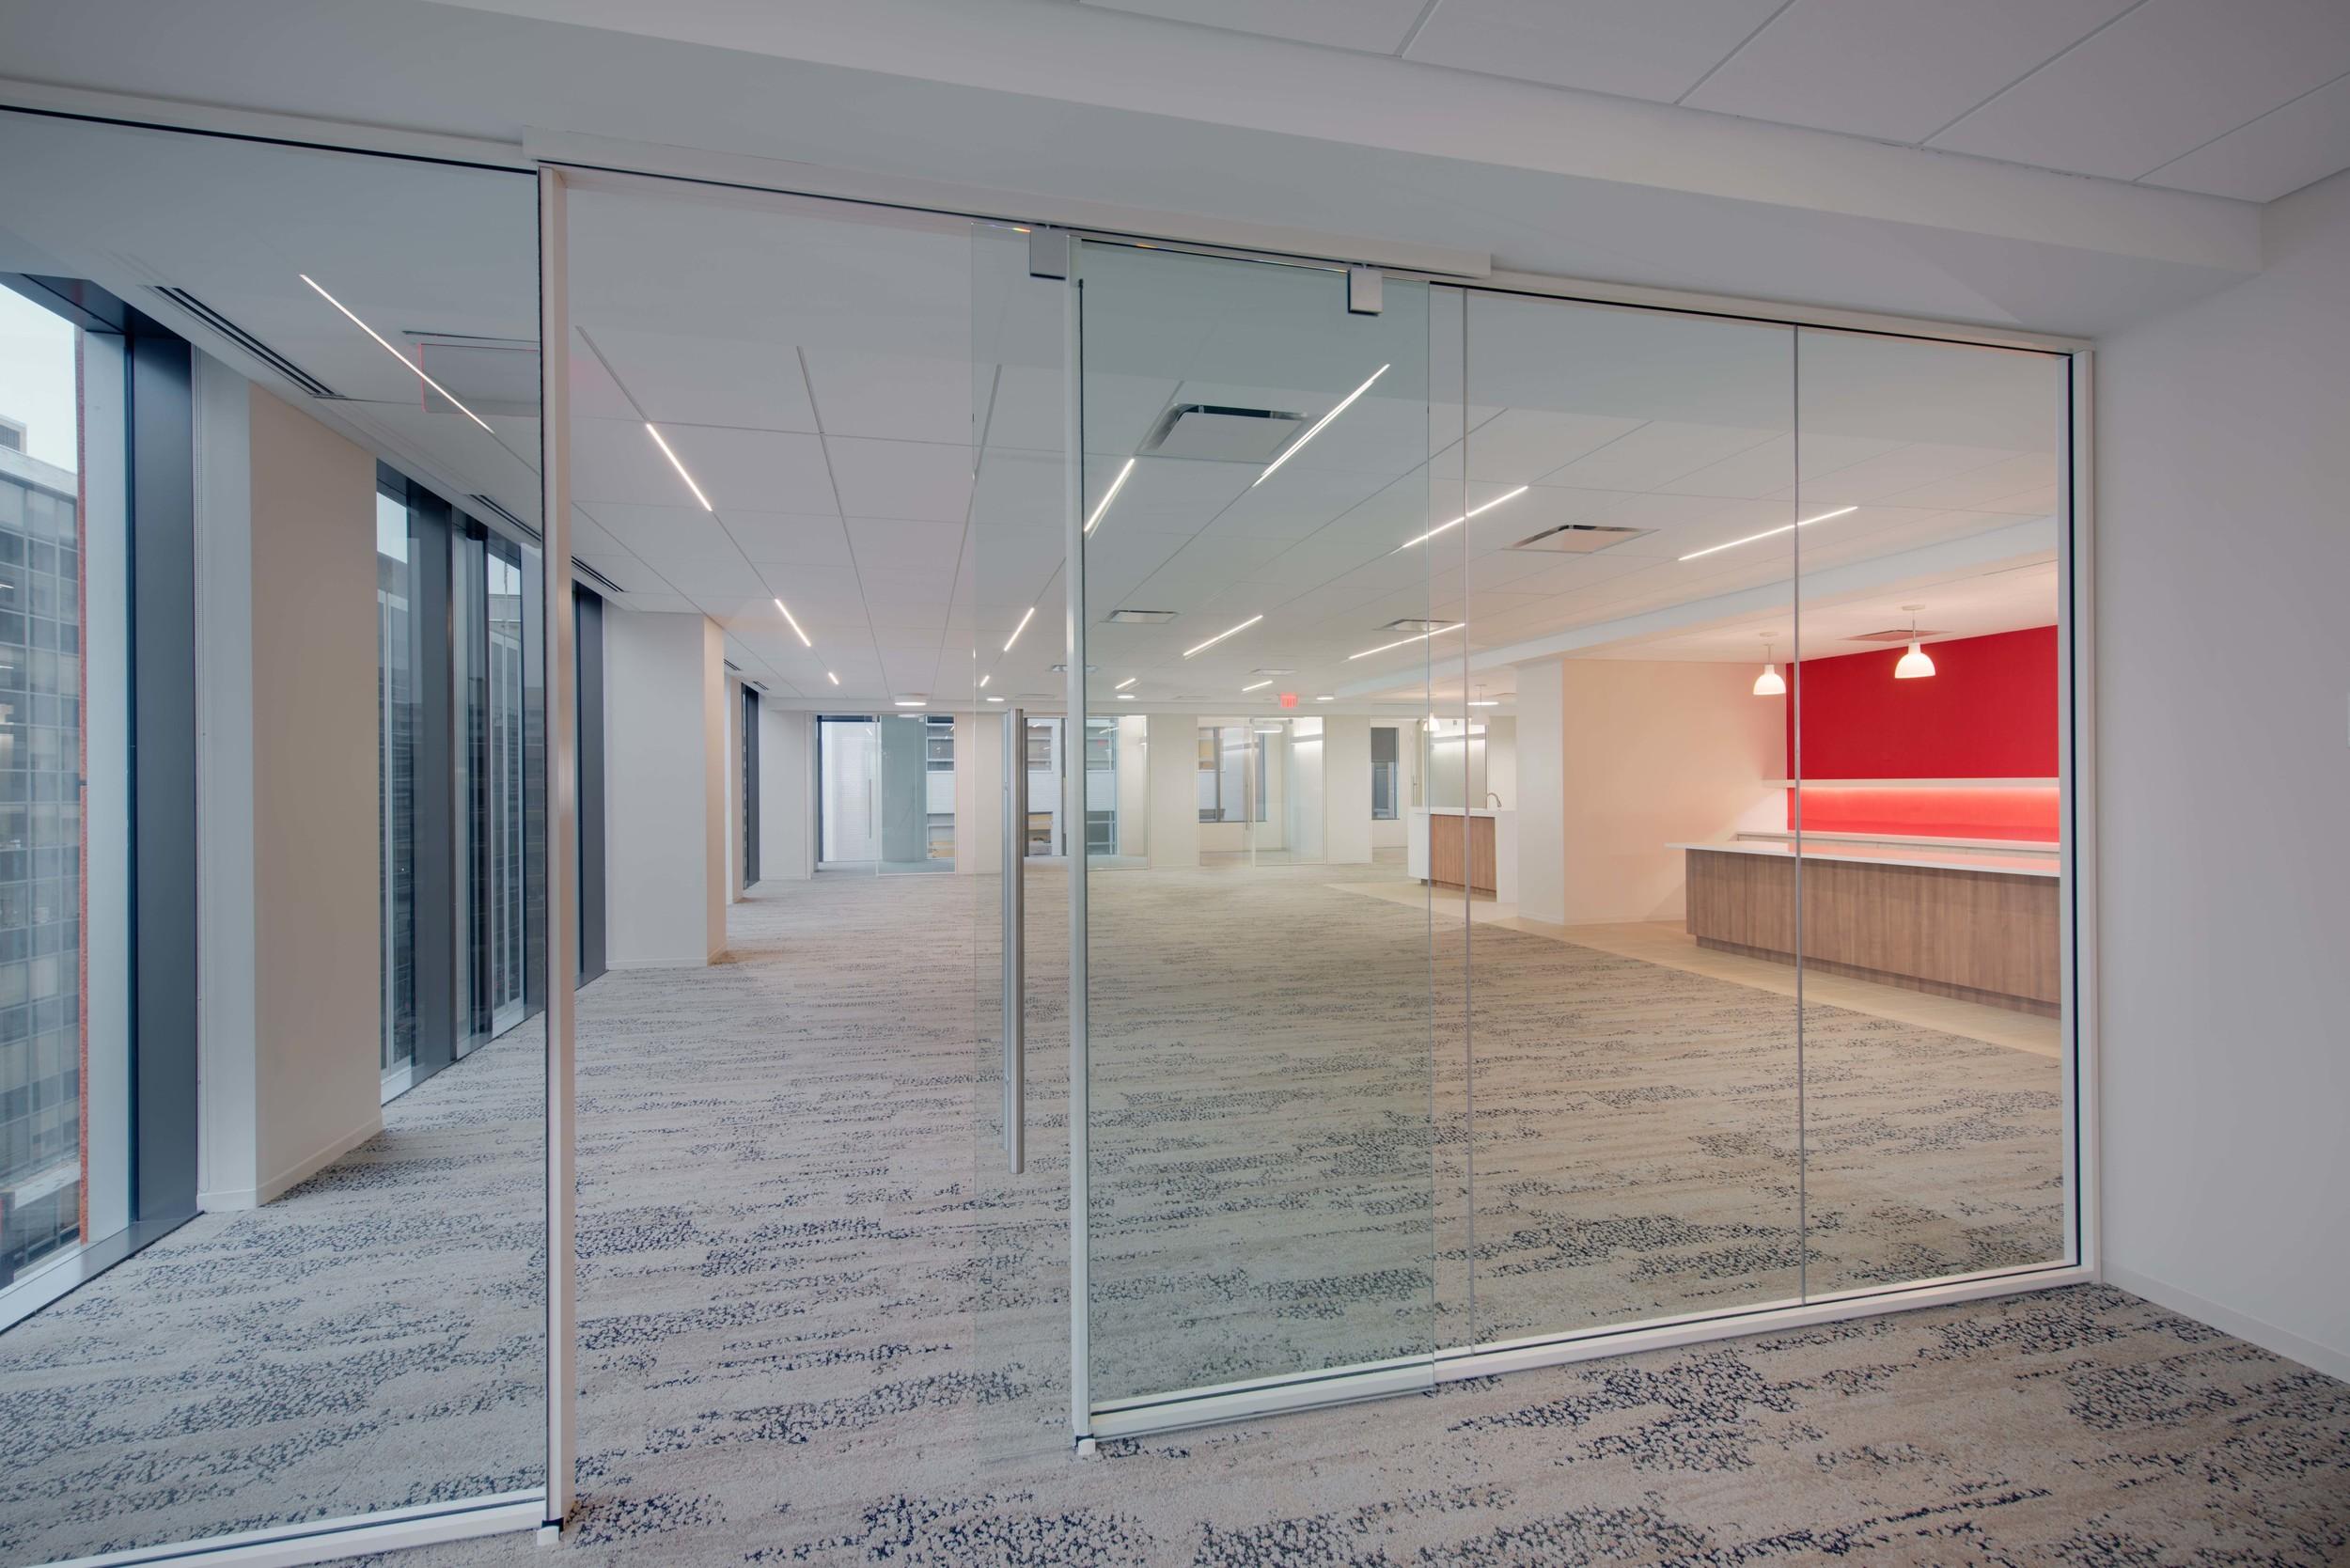 1200 17th Office Suite Interior Image 216628.jpg